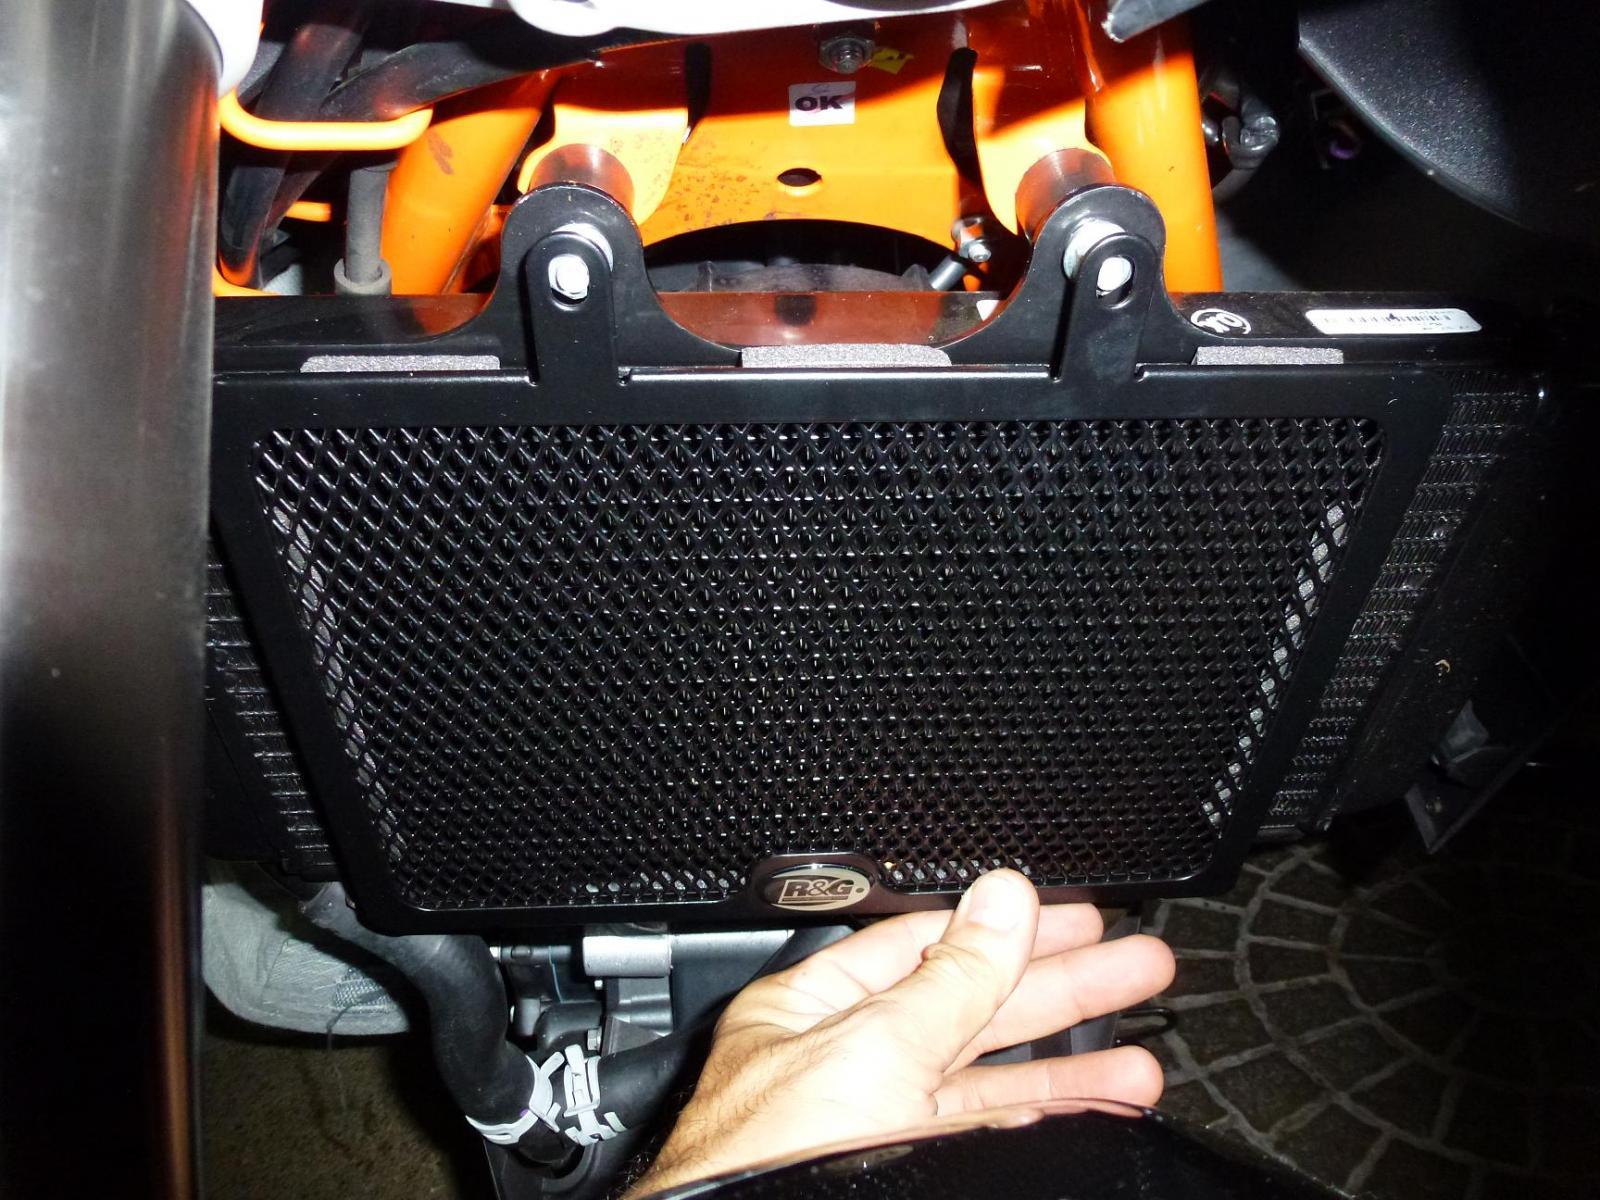 My Whip-r-g-radiator-guards-ktm-390-duke-002.jpg